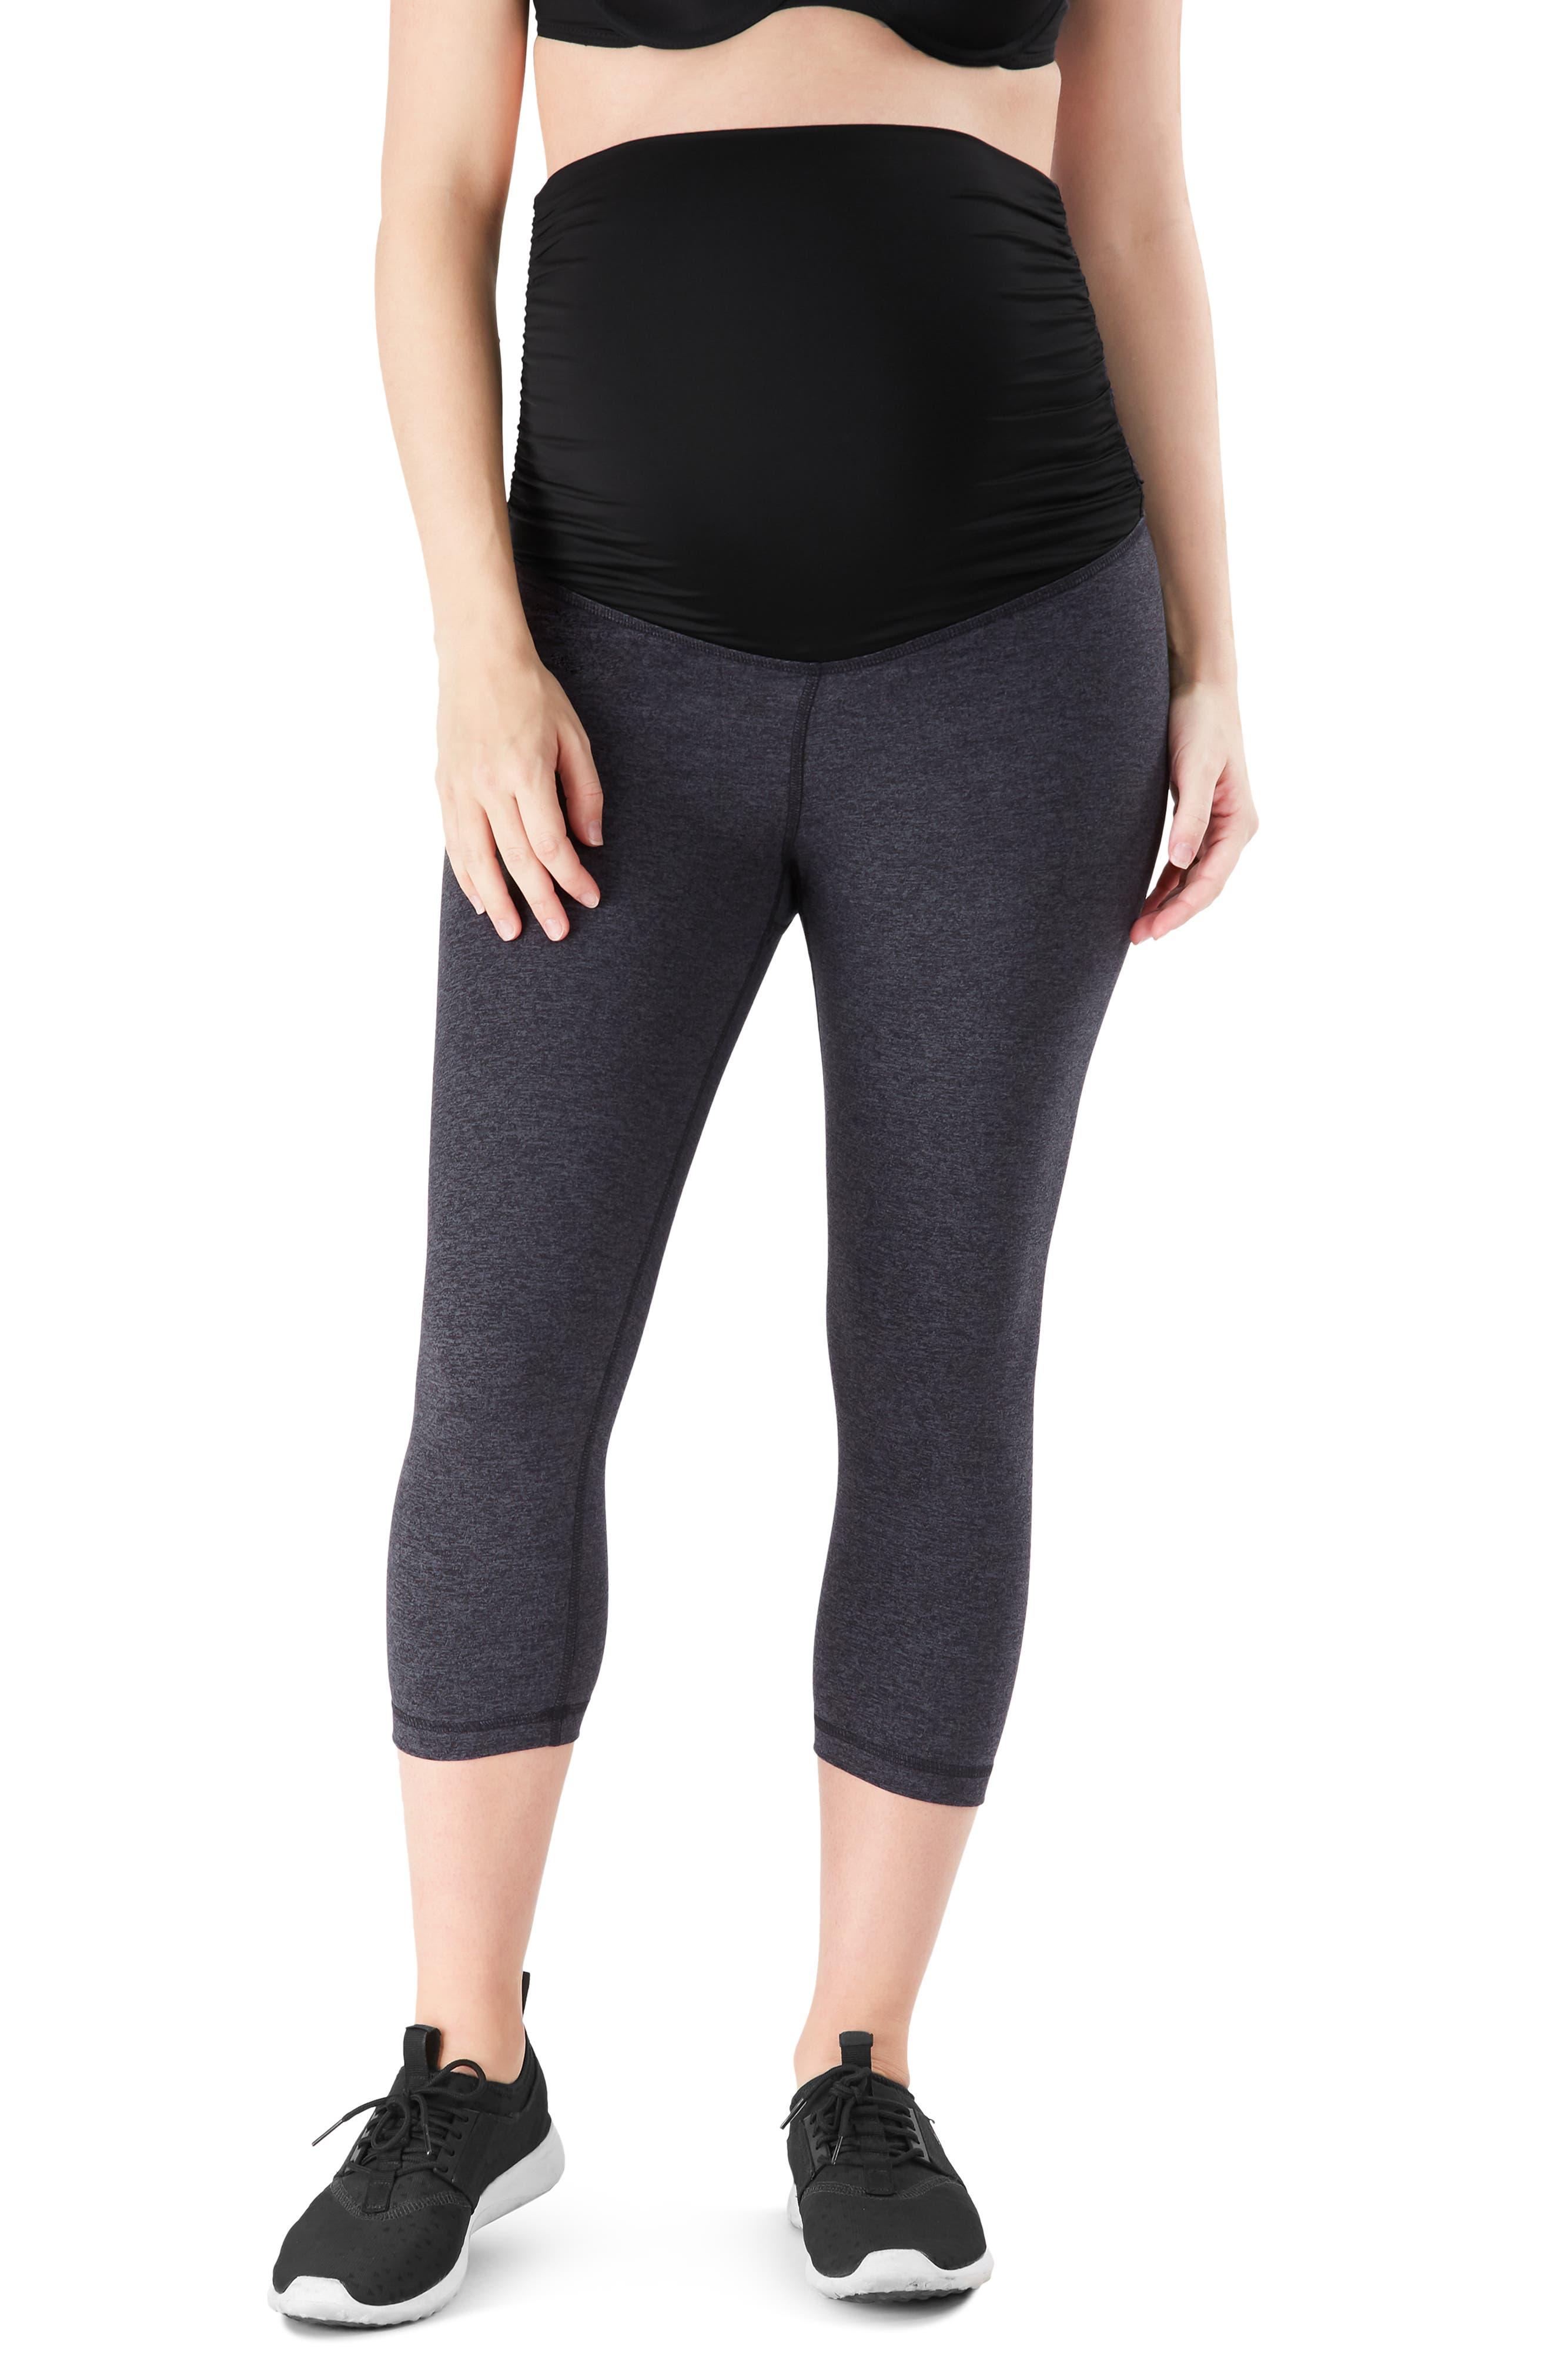 Belly Bandit(R) ActiveSupport(R) Essential Capri Maternity Leggings